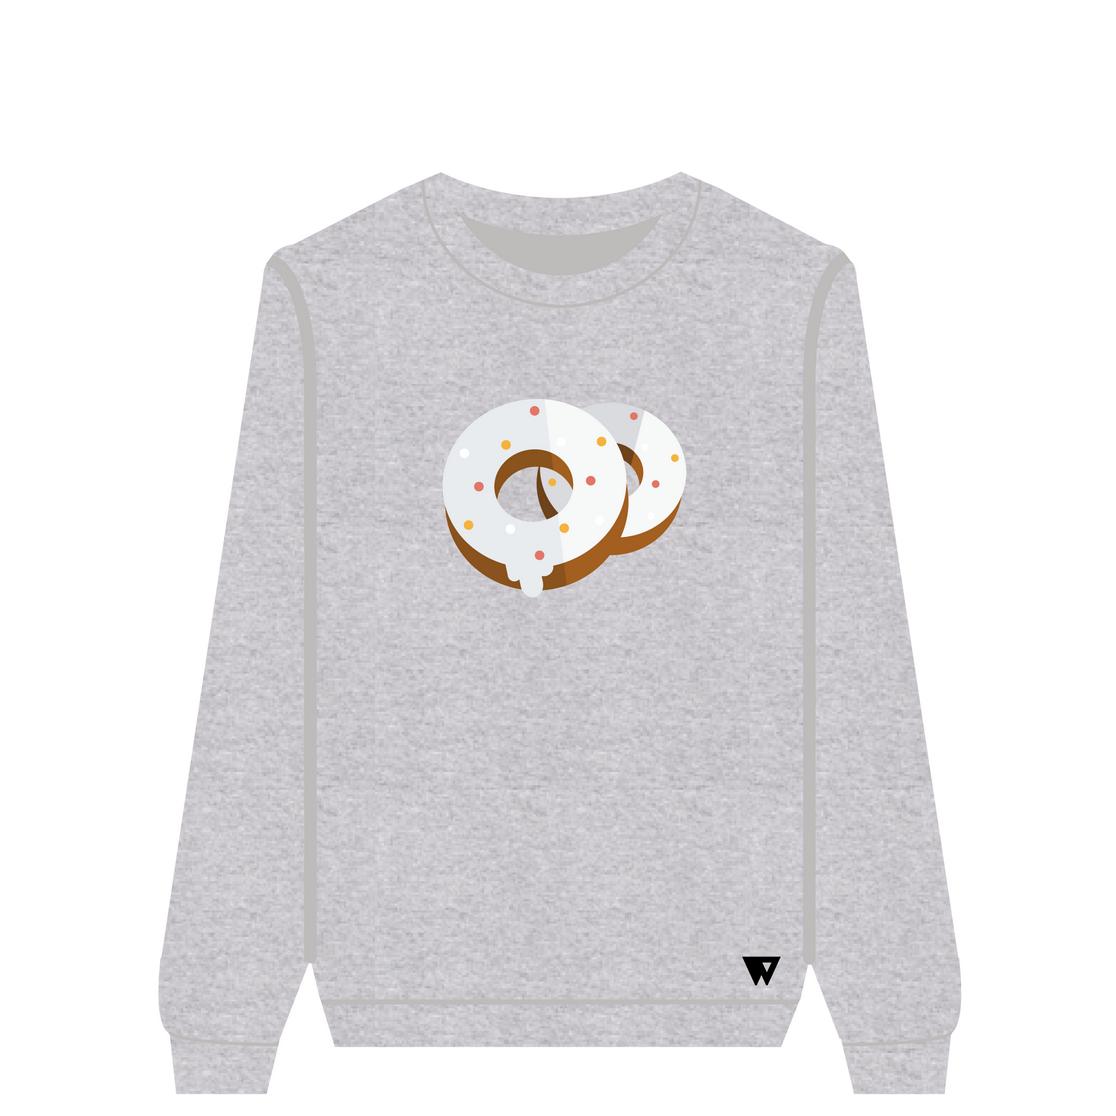 Sweatshirt Donuts | Wuzzee